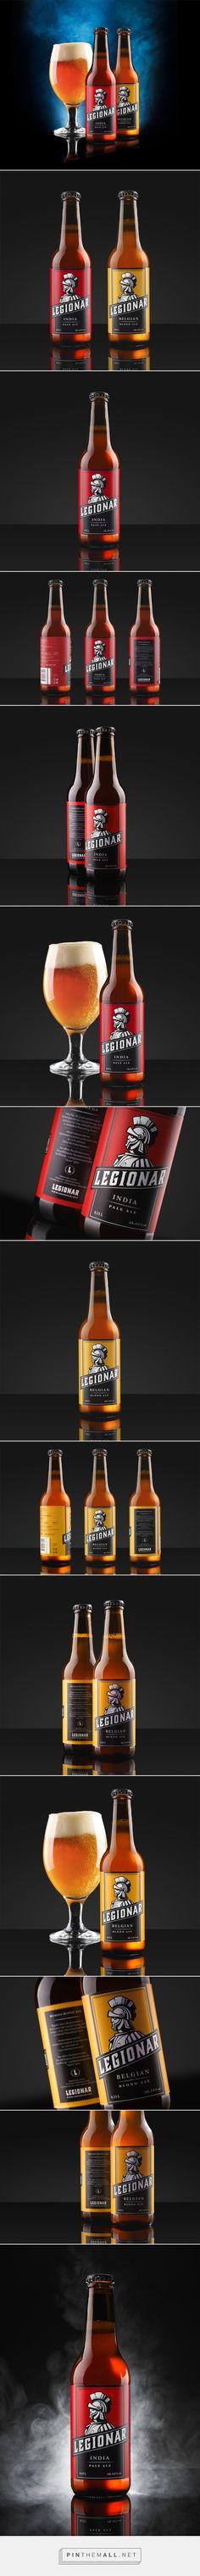 Legionar Beer - Packaging of the World - Creative Package Design Gallery - http://www.packagingoftheworld.com/2016/09/legionar.html